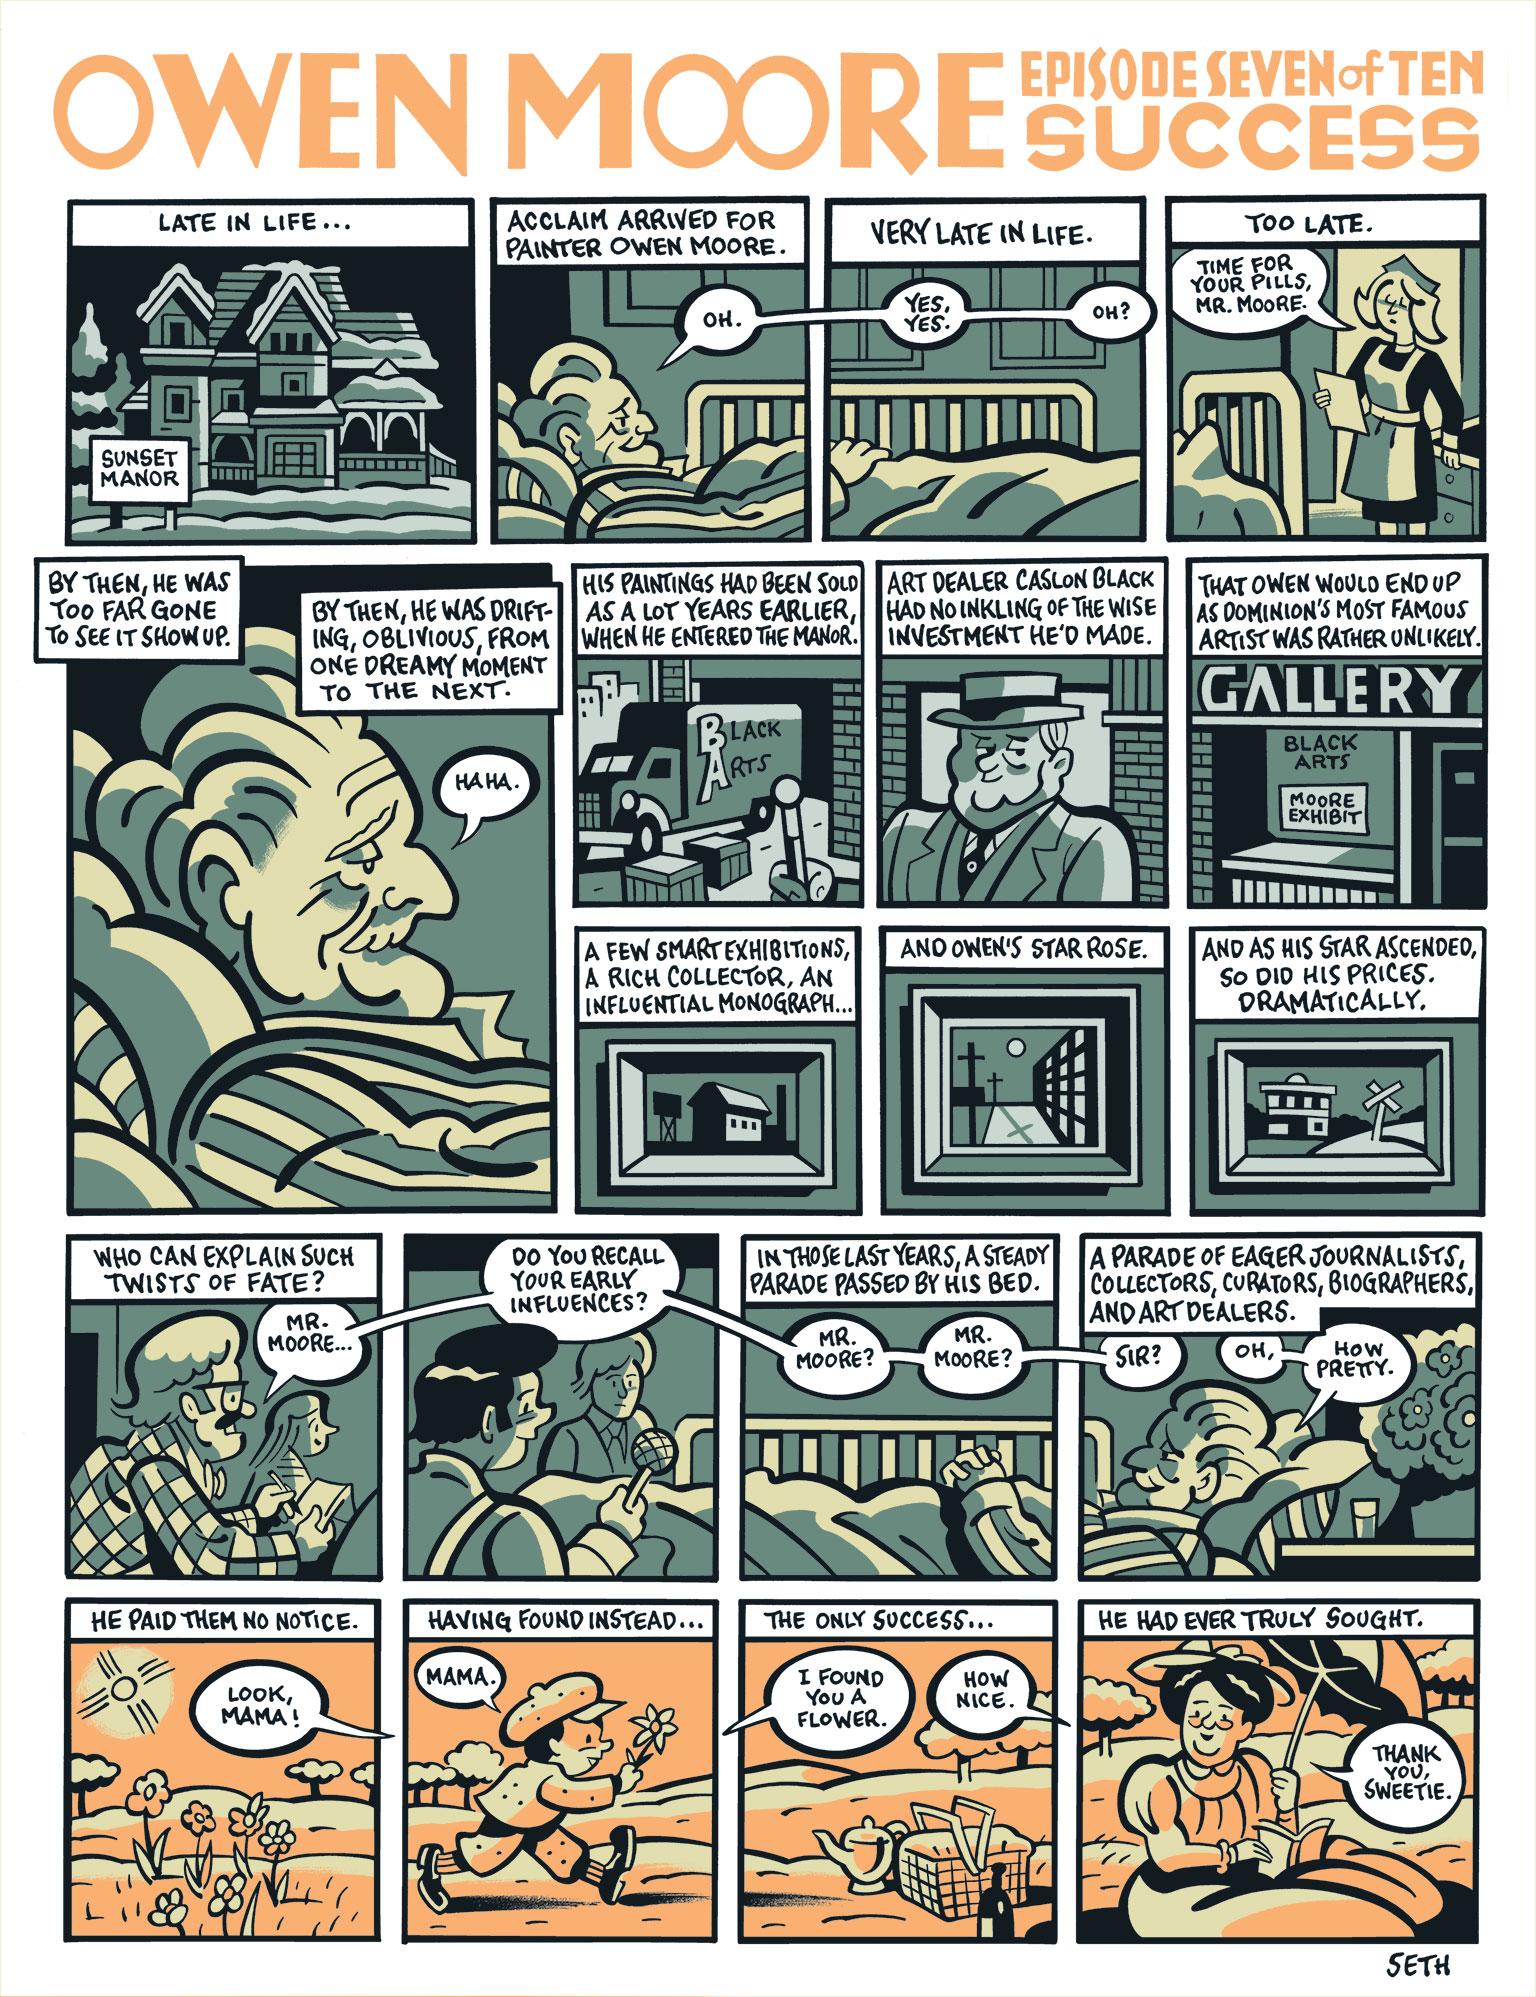 Comic by Seth